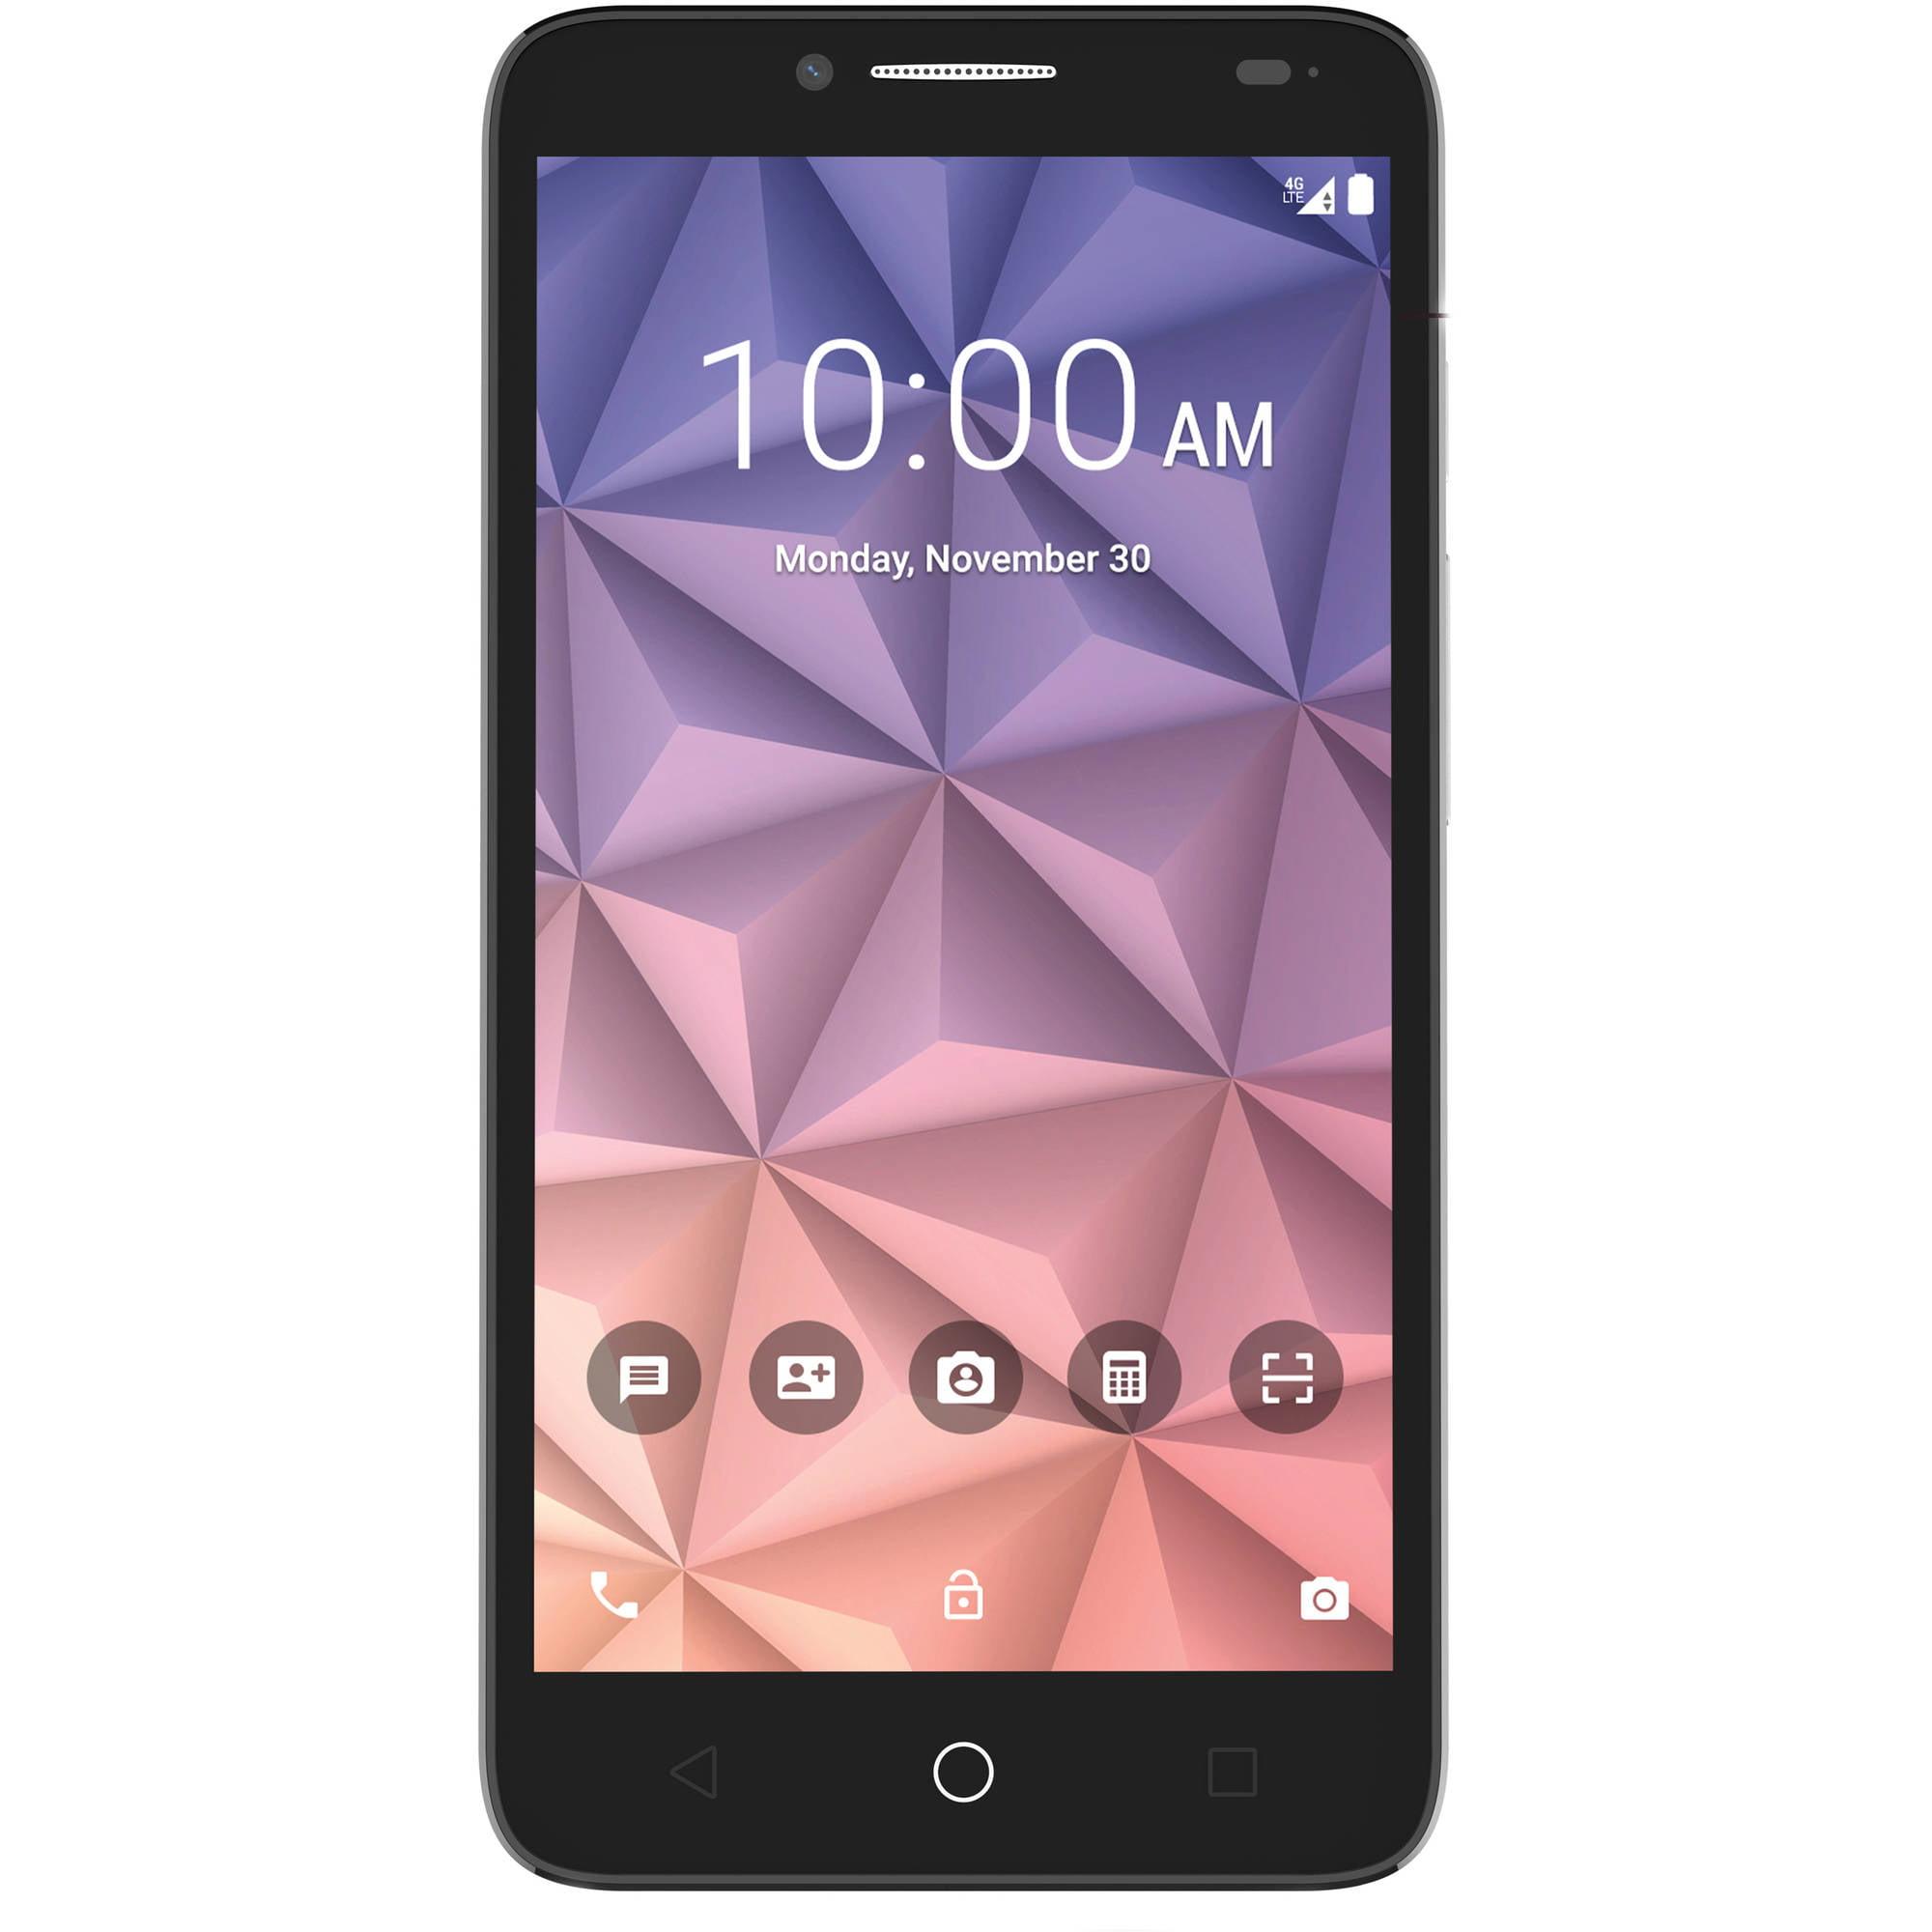 Walmart Family Mobile ALCATEL ONETOUCH Fierce XL Smartphone